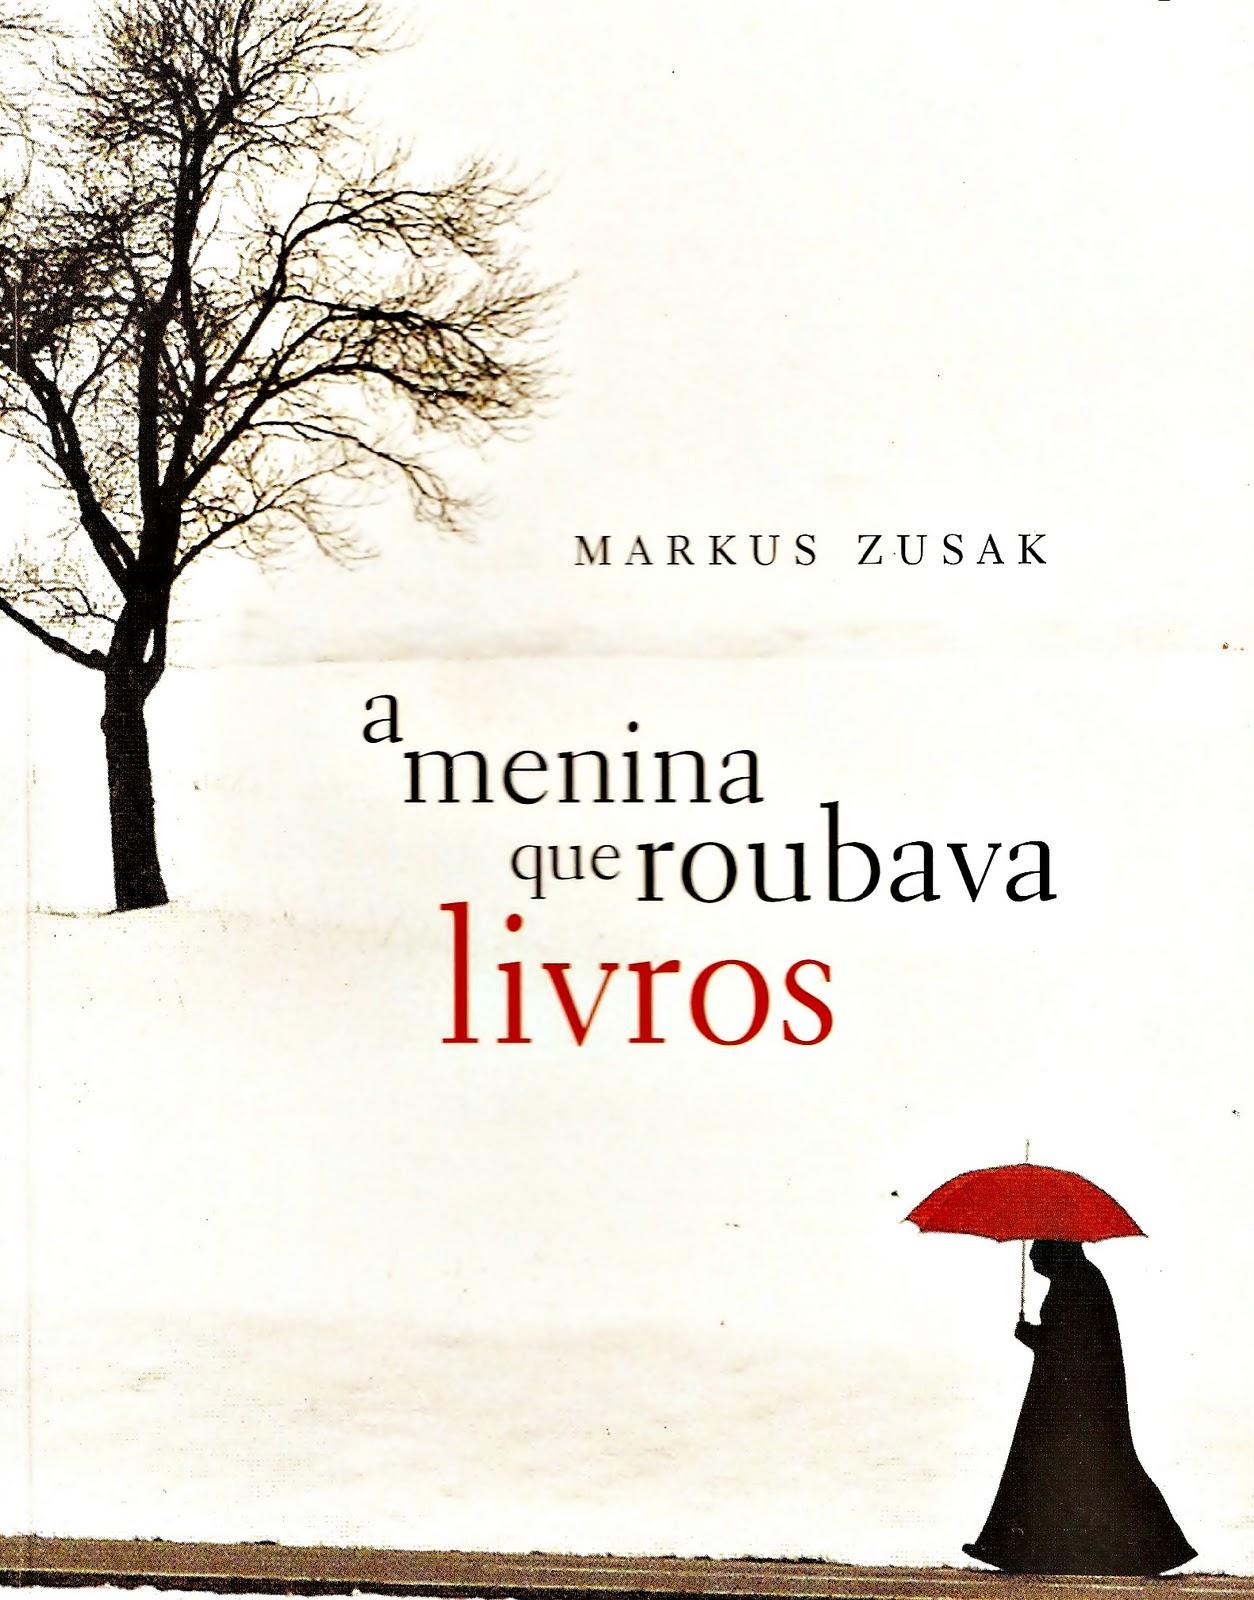 http://tequiladiaria.files.wordpress.com/2013/11/a_menina_que_roubava_livros.jpg